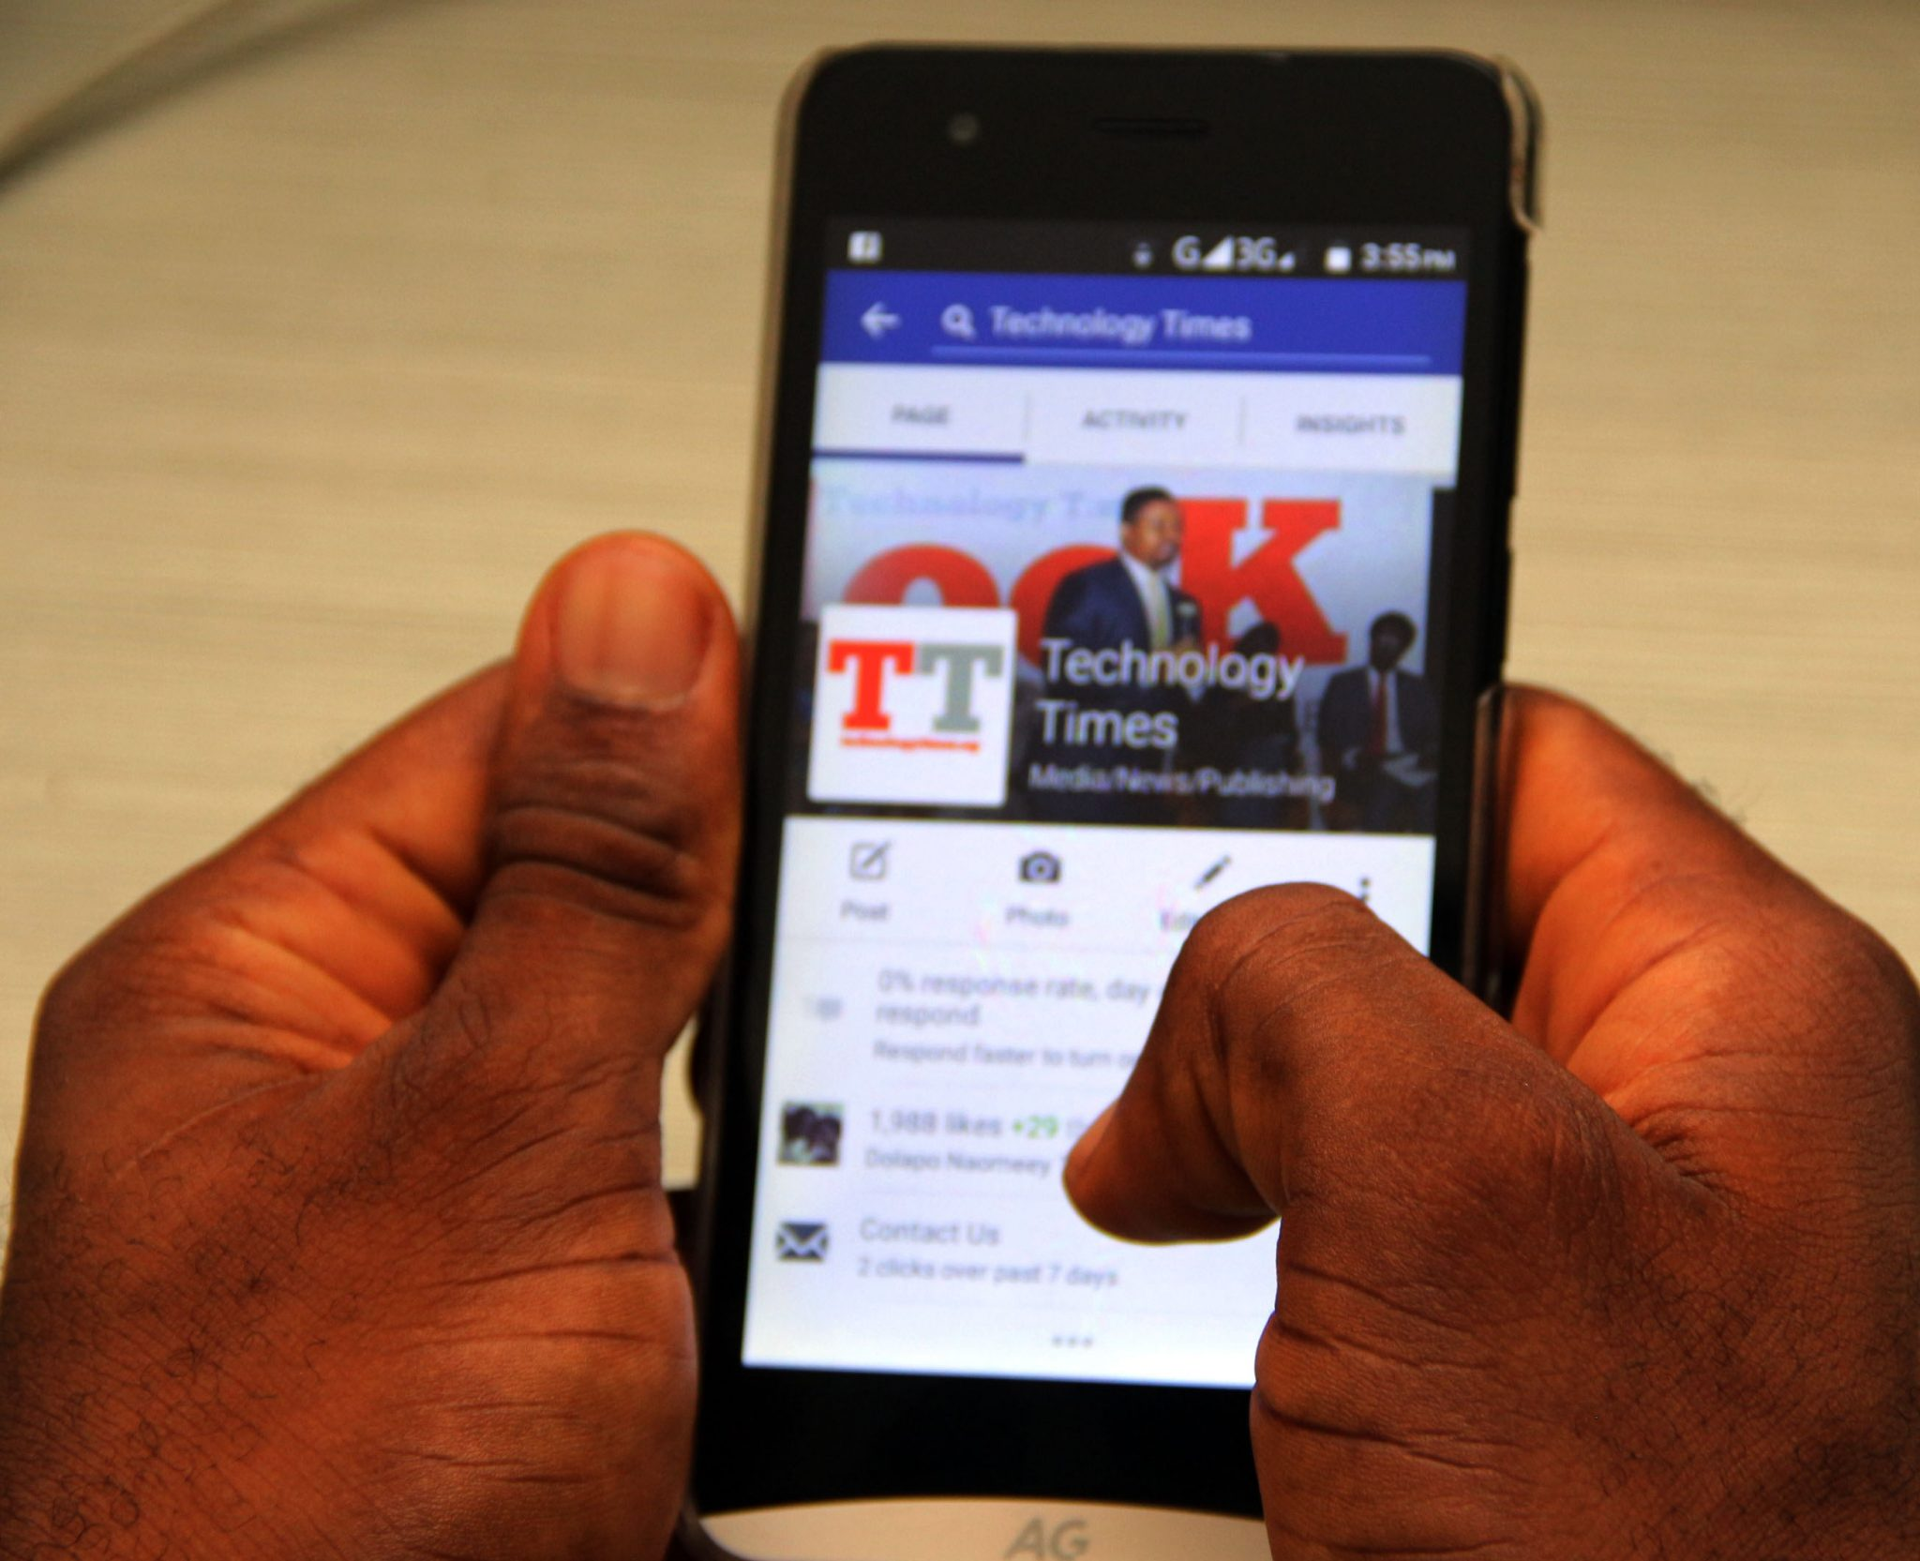 Bots returns to Facebook Messenger